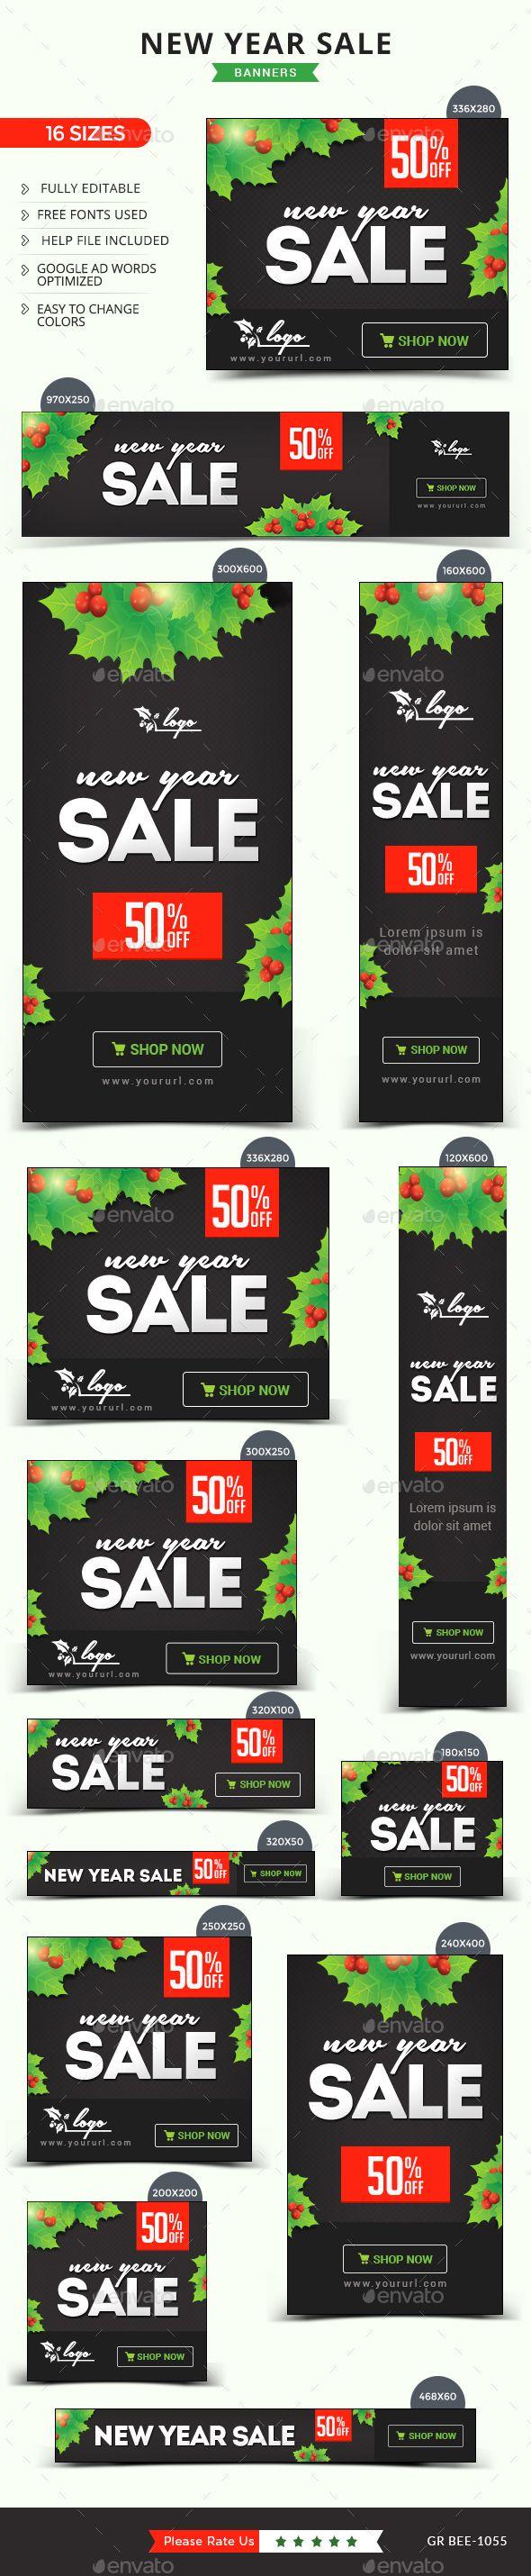 sales advertisement templates